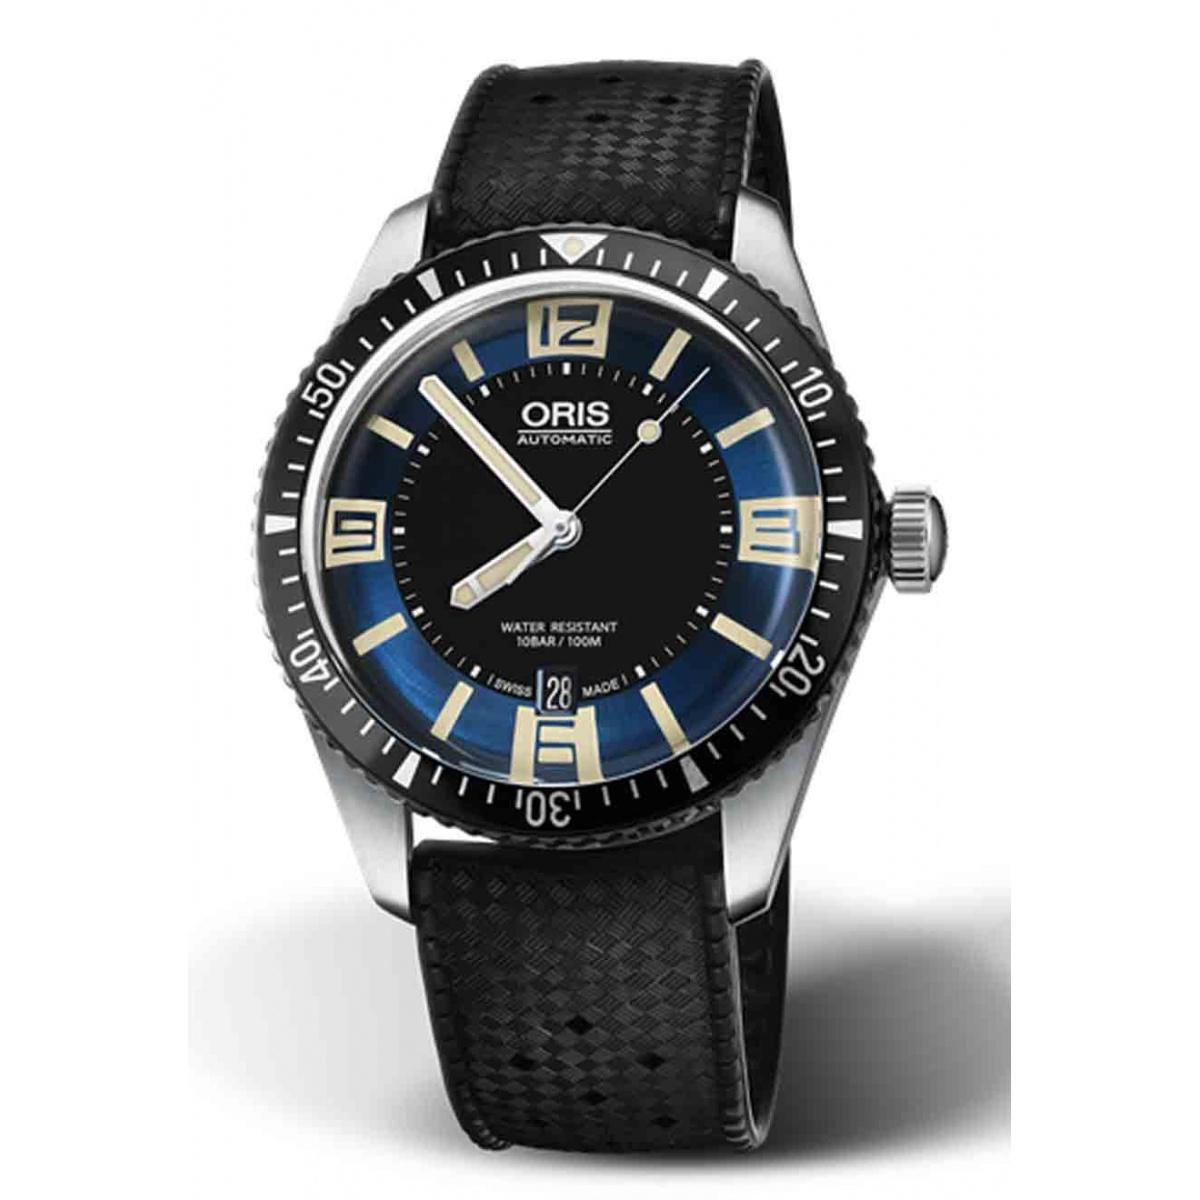 ORIS DIVERS SIXTY-FIVE -100 M ∅40 mm, Esfera azul y negra número, caucho negro